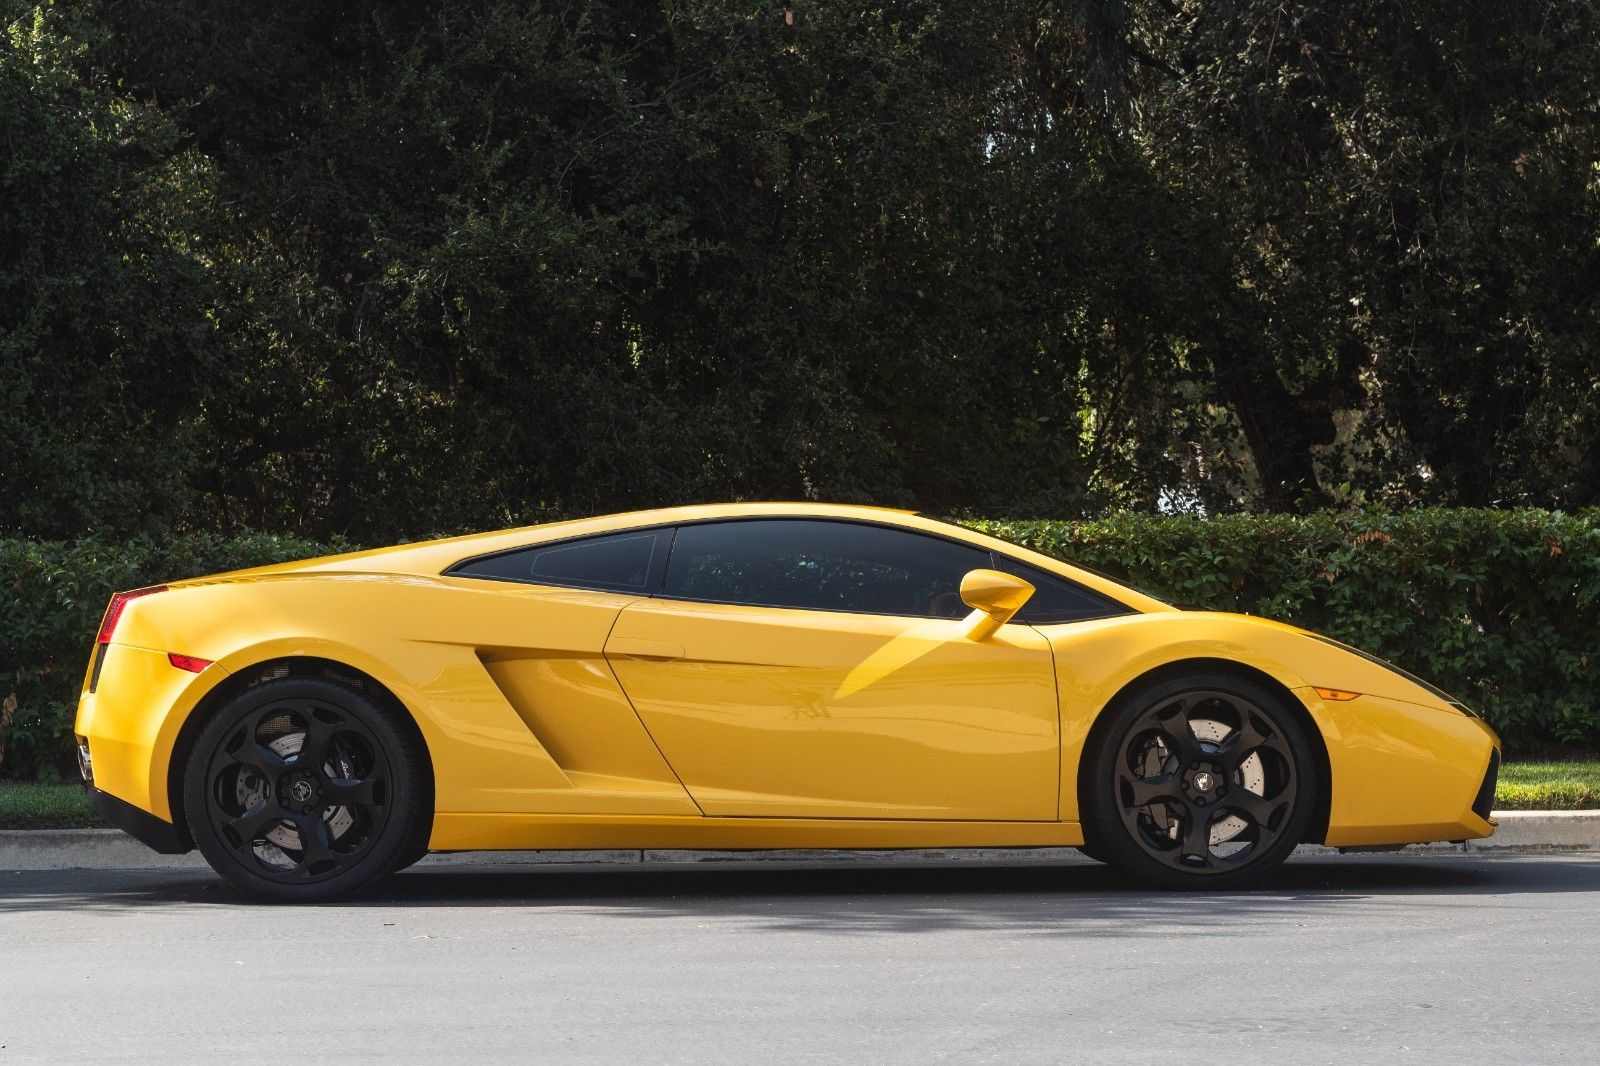 Lamborghini Gallardo 2017 >> Awesome 2005 Lamborghini Gallardo 2005 Lamborghini Gallardo